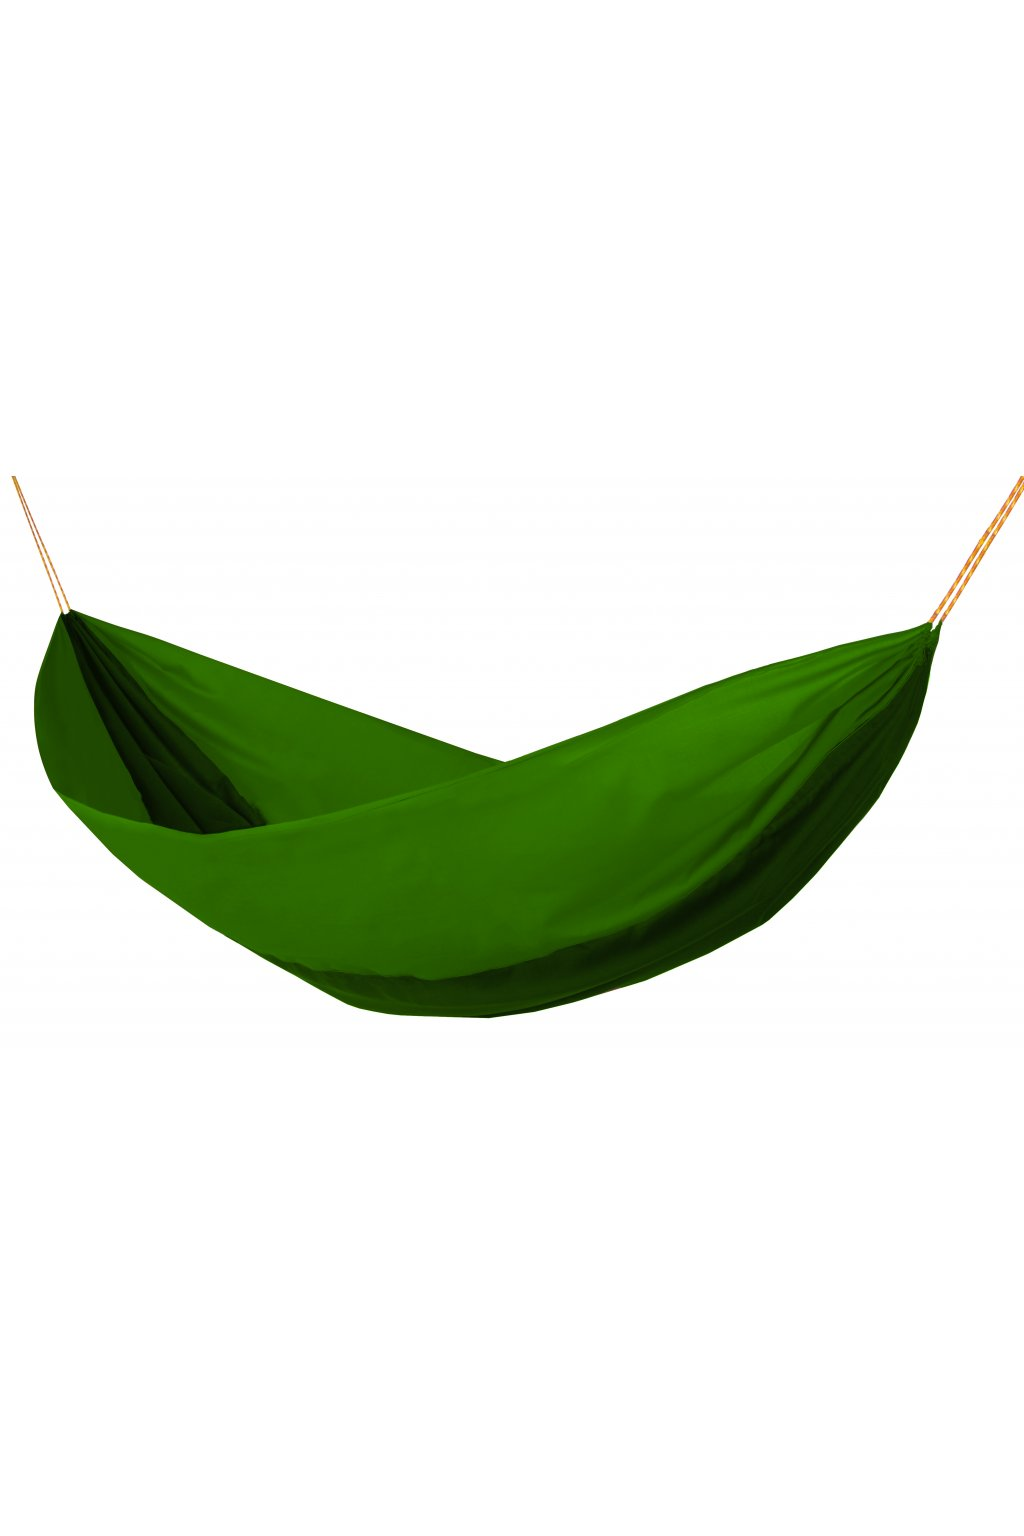 794 houpaci sit hamaka original pro jednoho brcalovo zeleno brcalova vyprodej